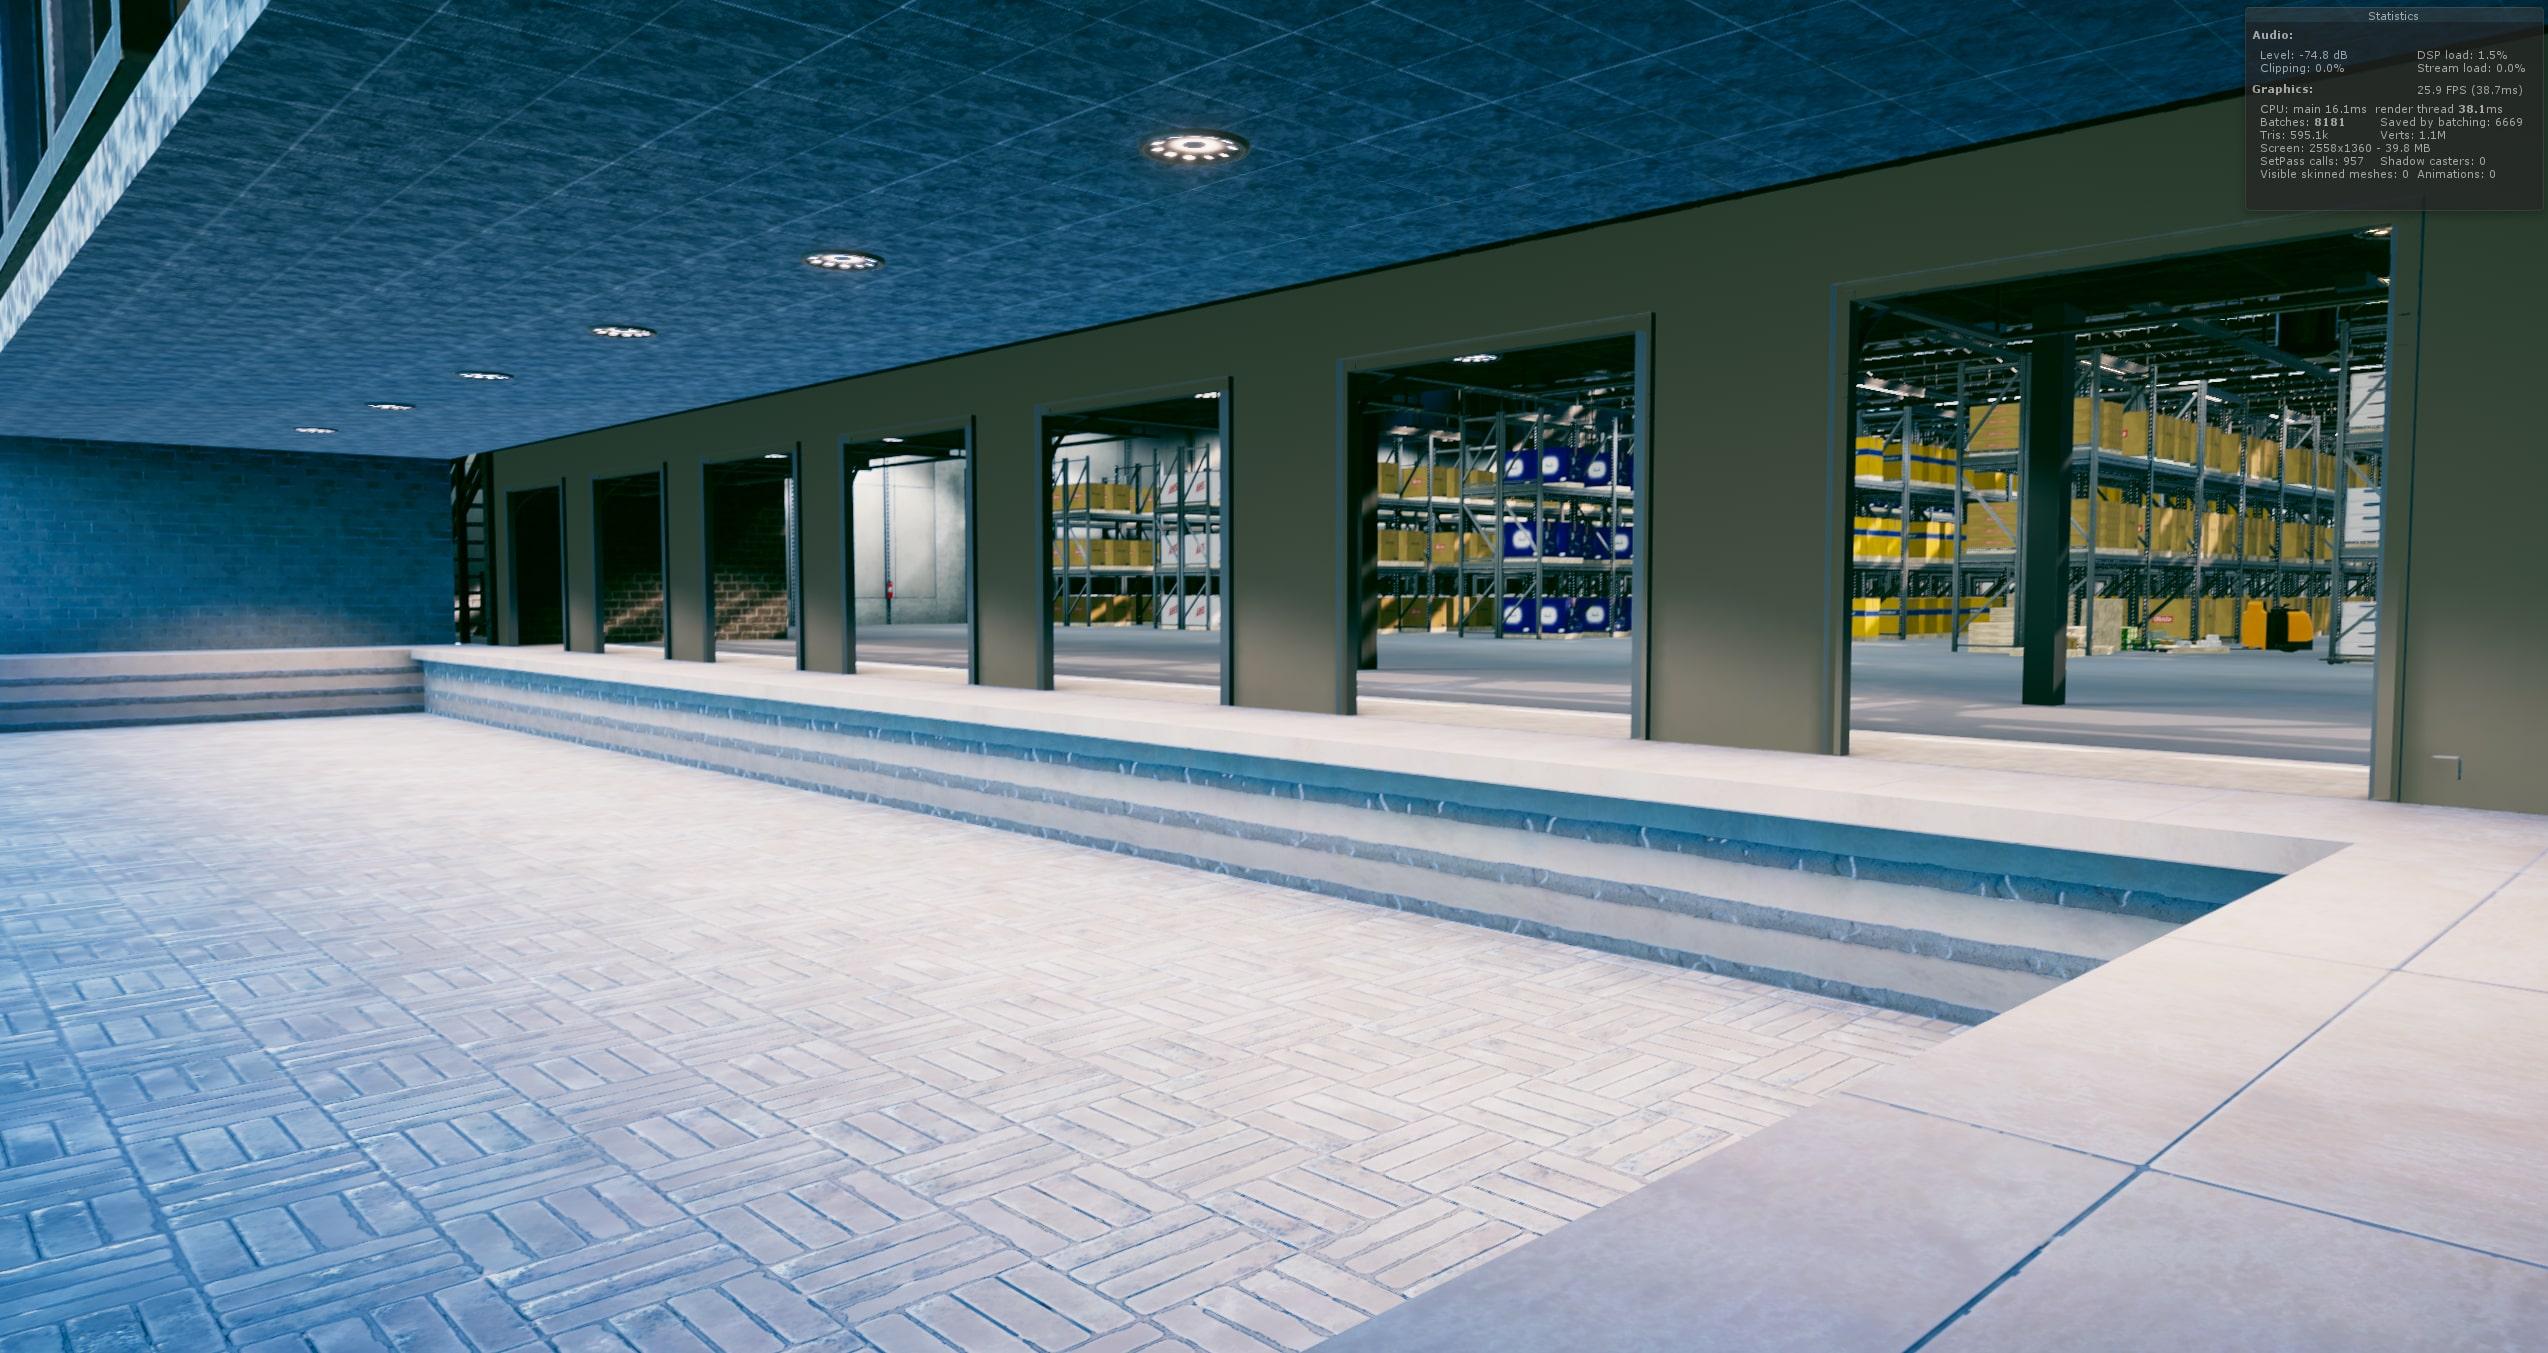 Warehouse Game Loading Docks